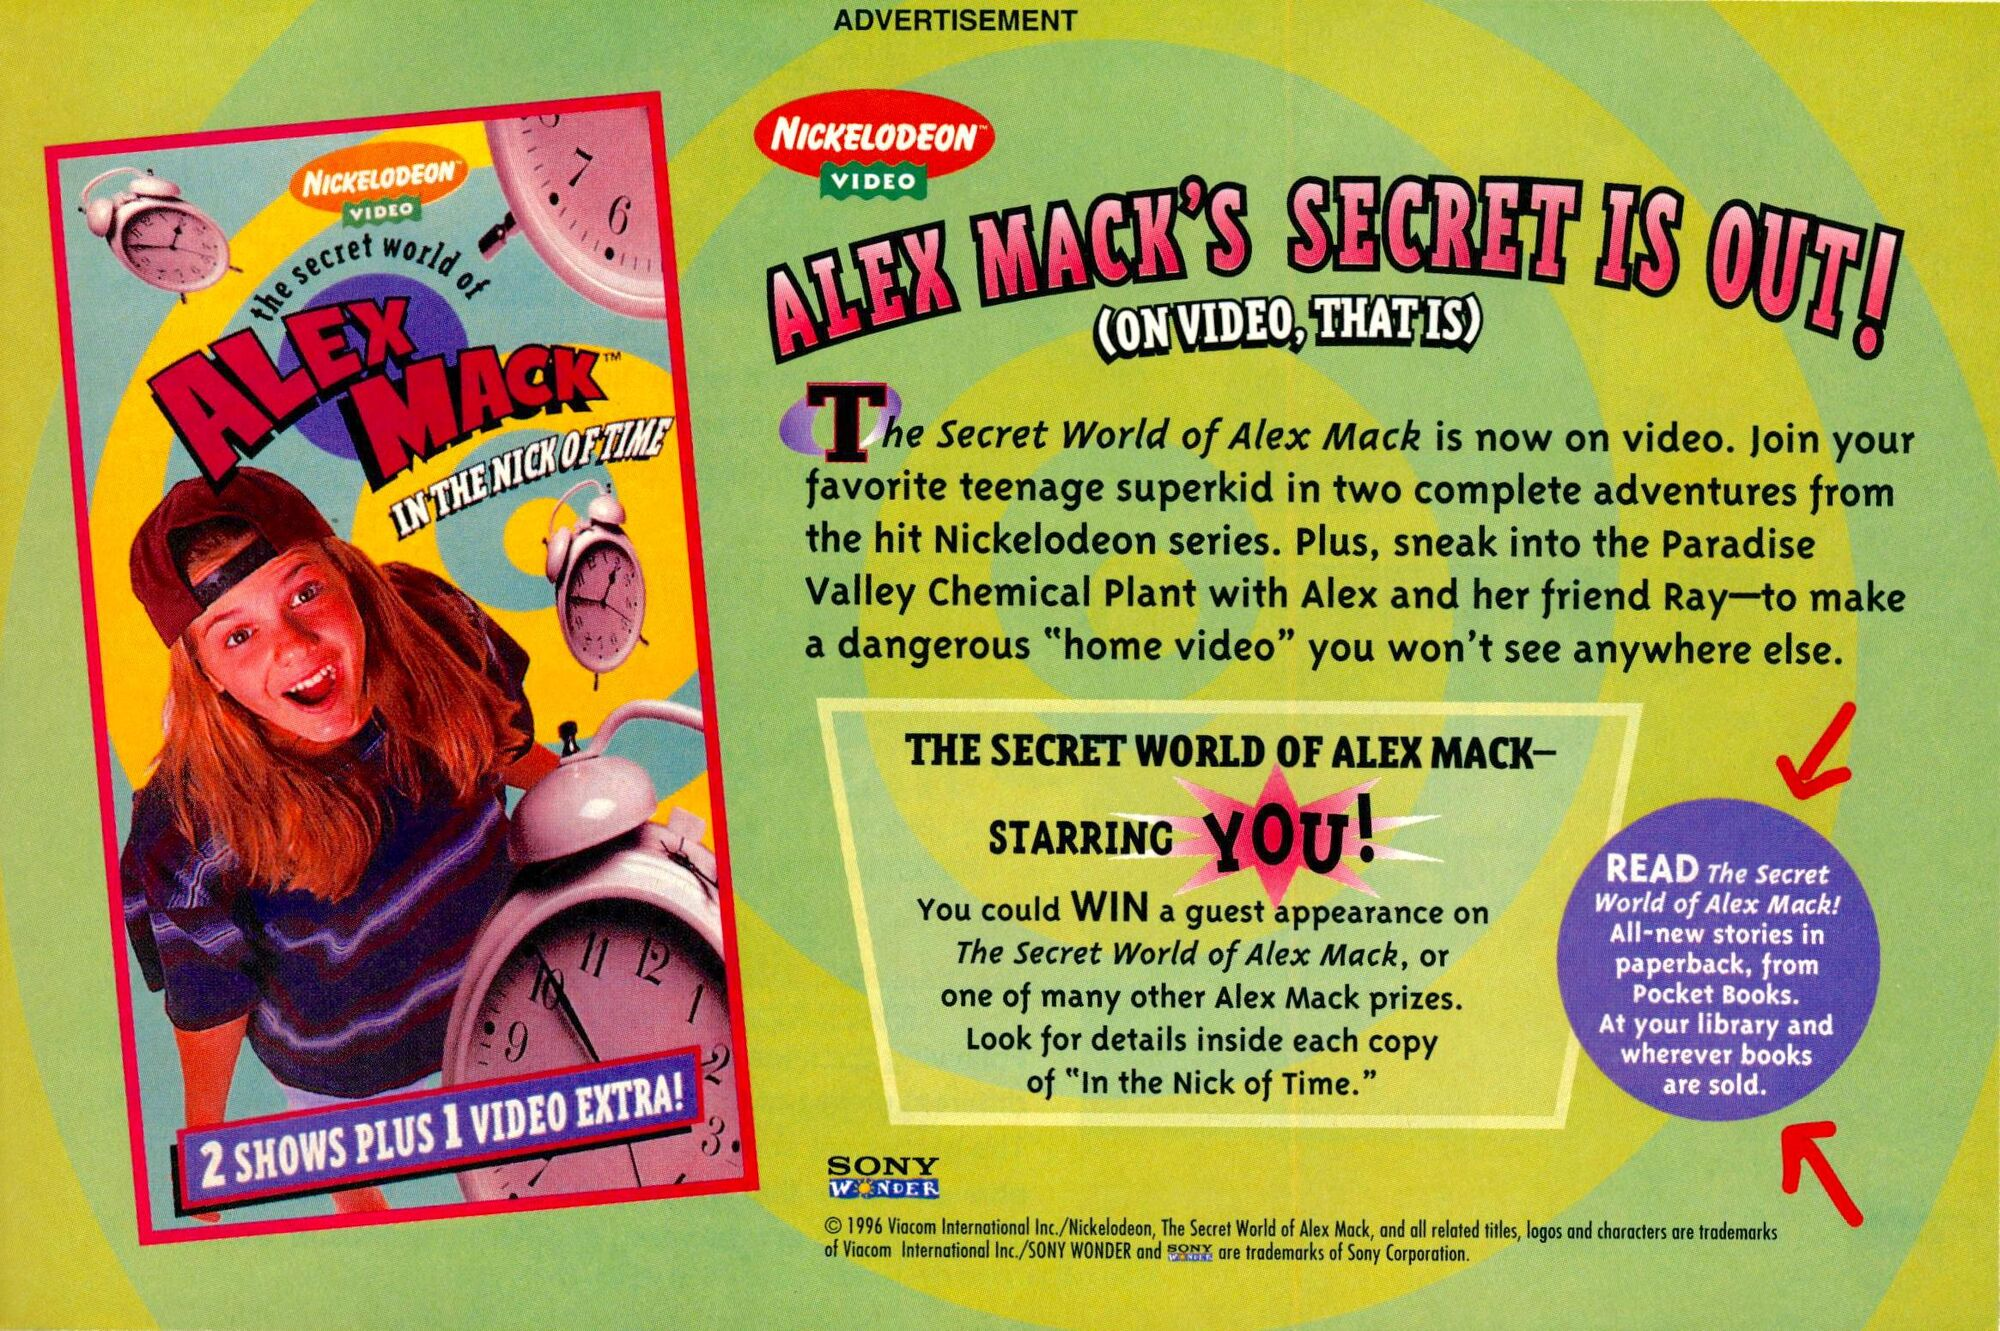 The Secret World of Alex Mack Nickelodeon